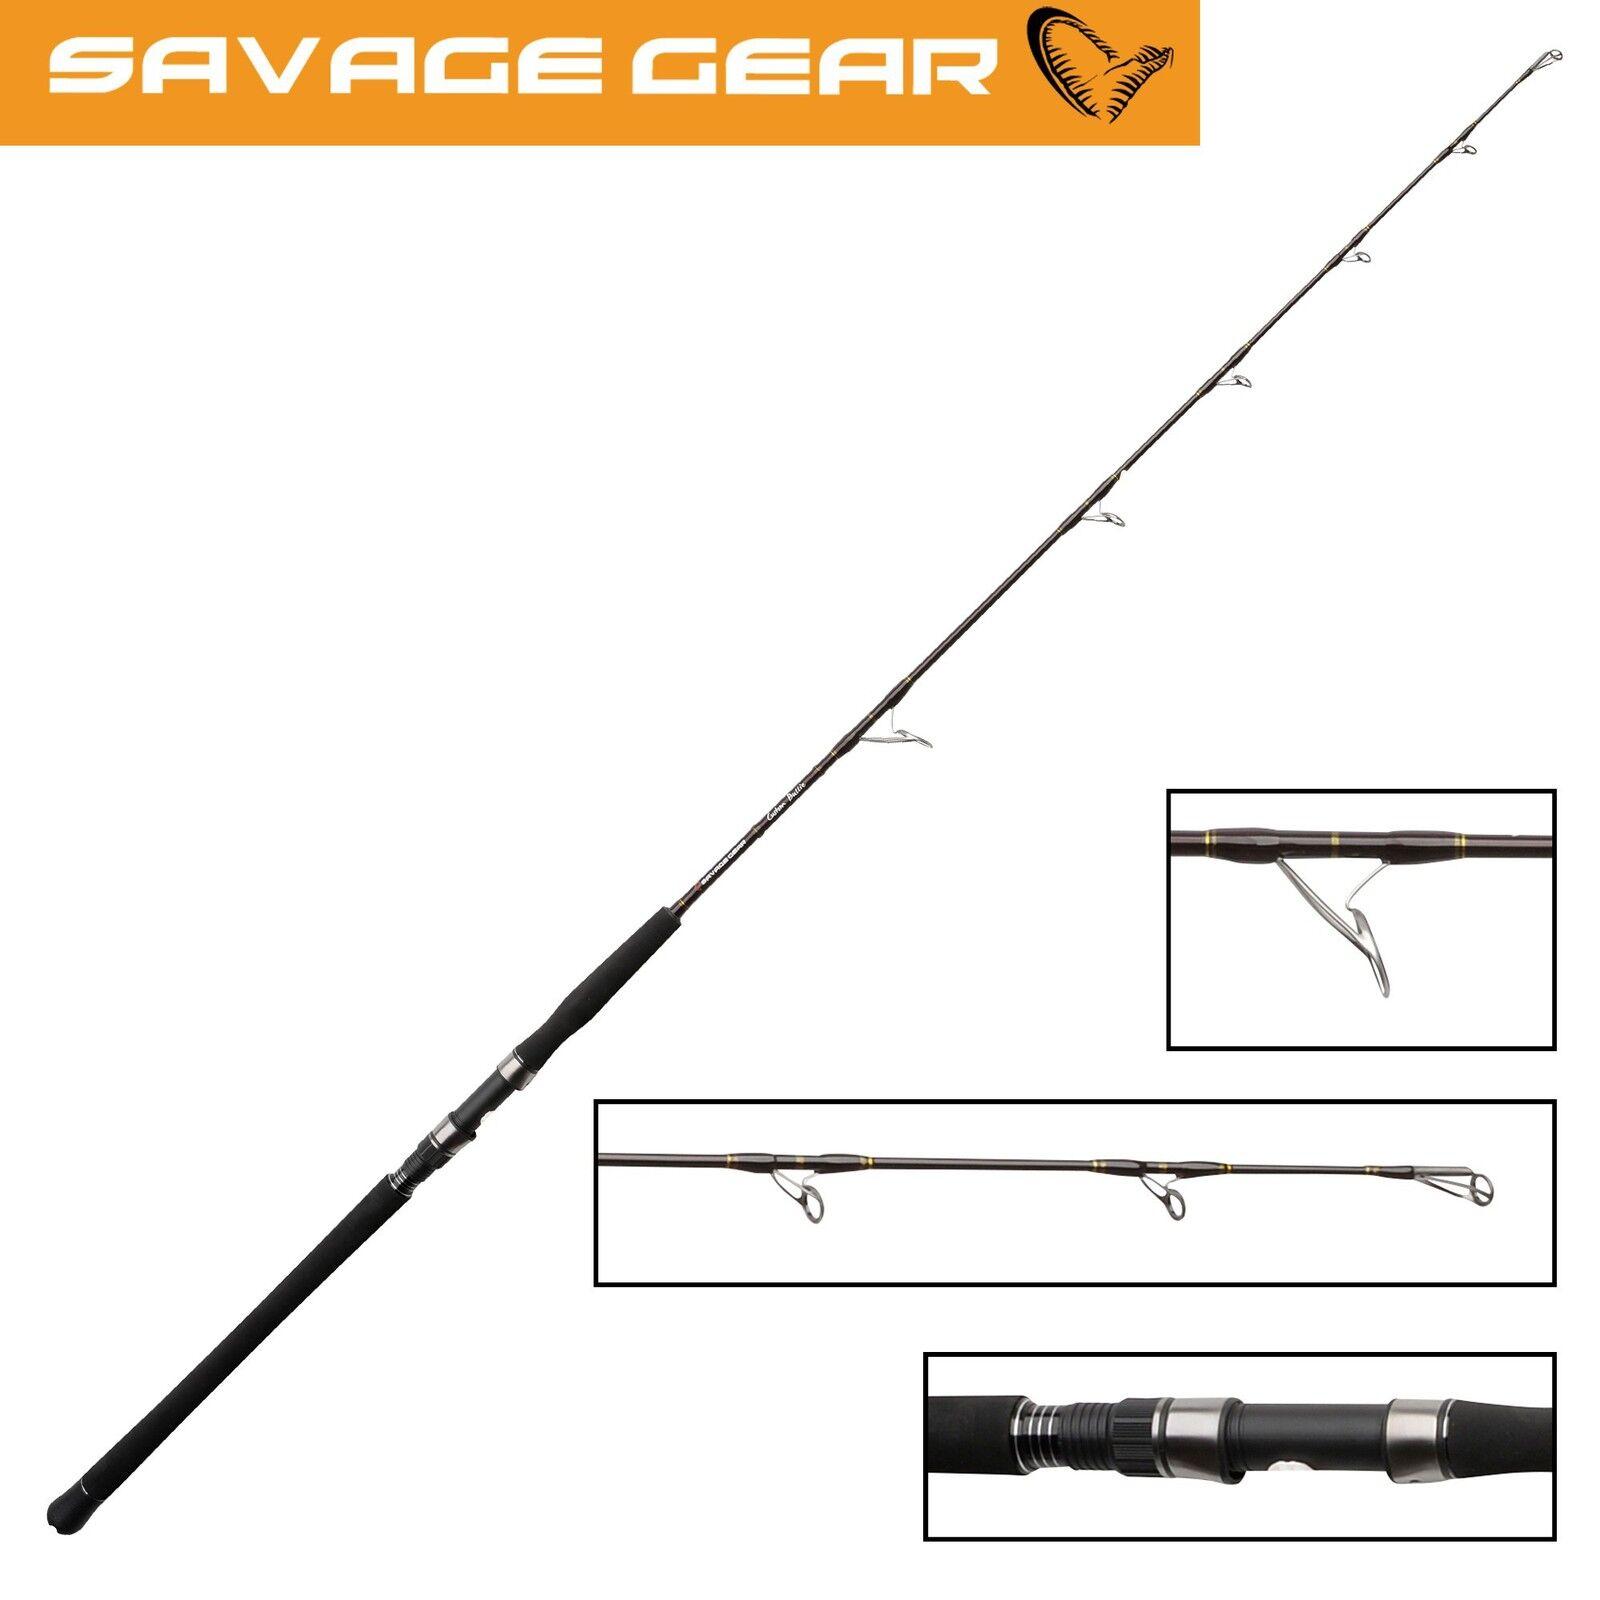 Savage Gear Custom Custom Custom Boat Bullie Spin 168cm 250-600g - Spinnrute fürs Meeresangeln 6ad78a